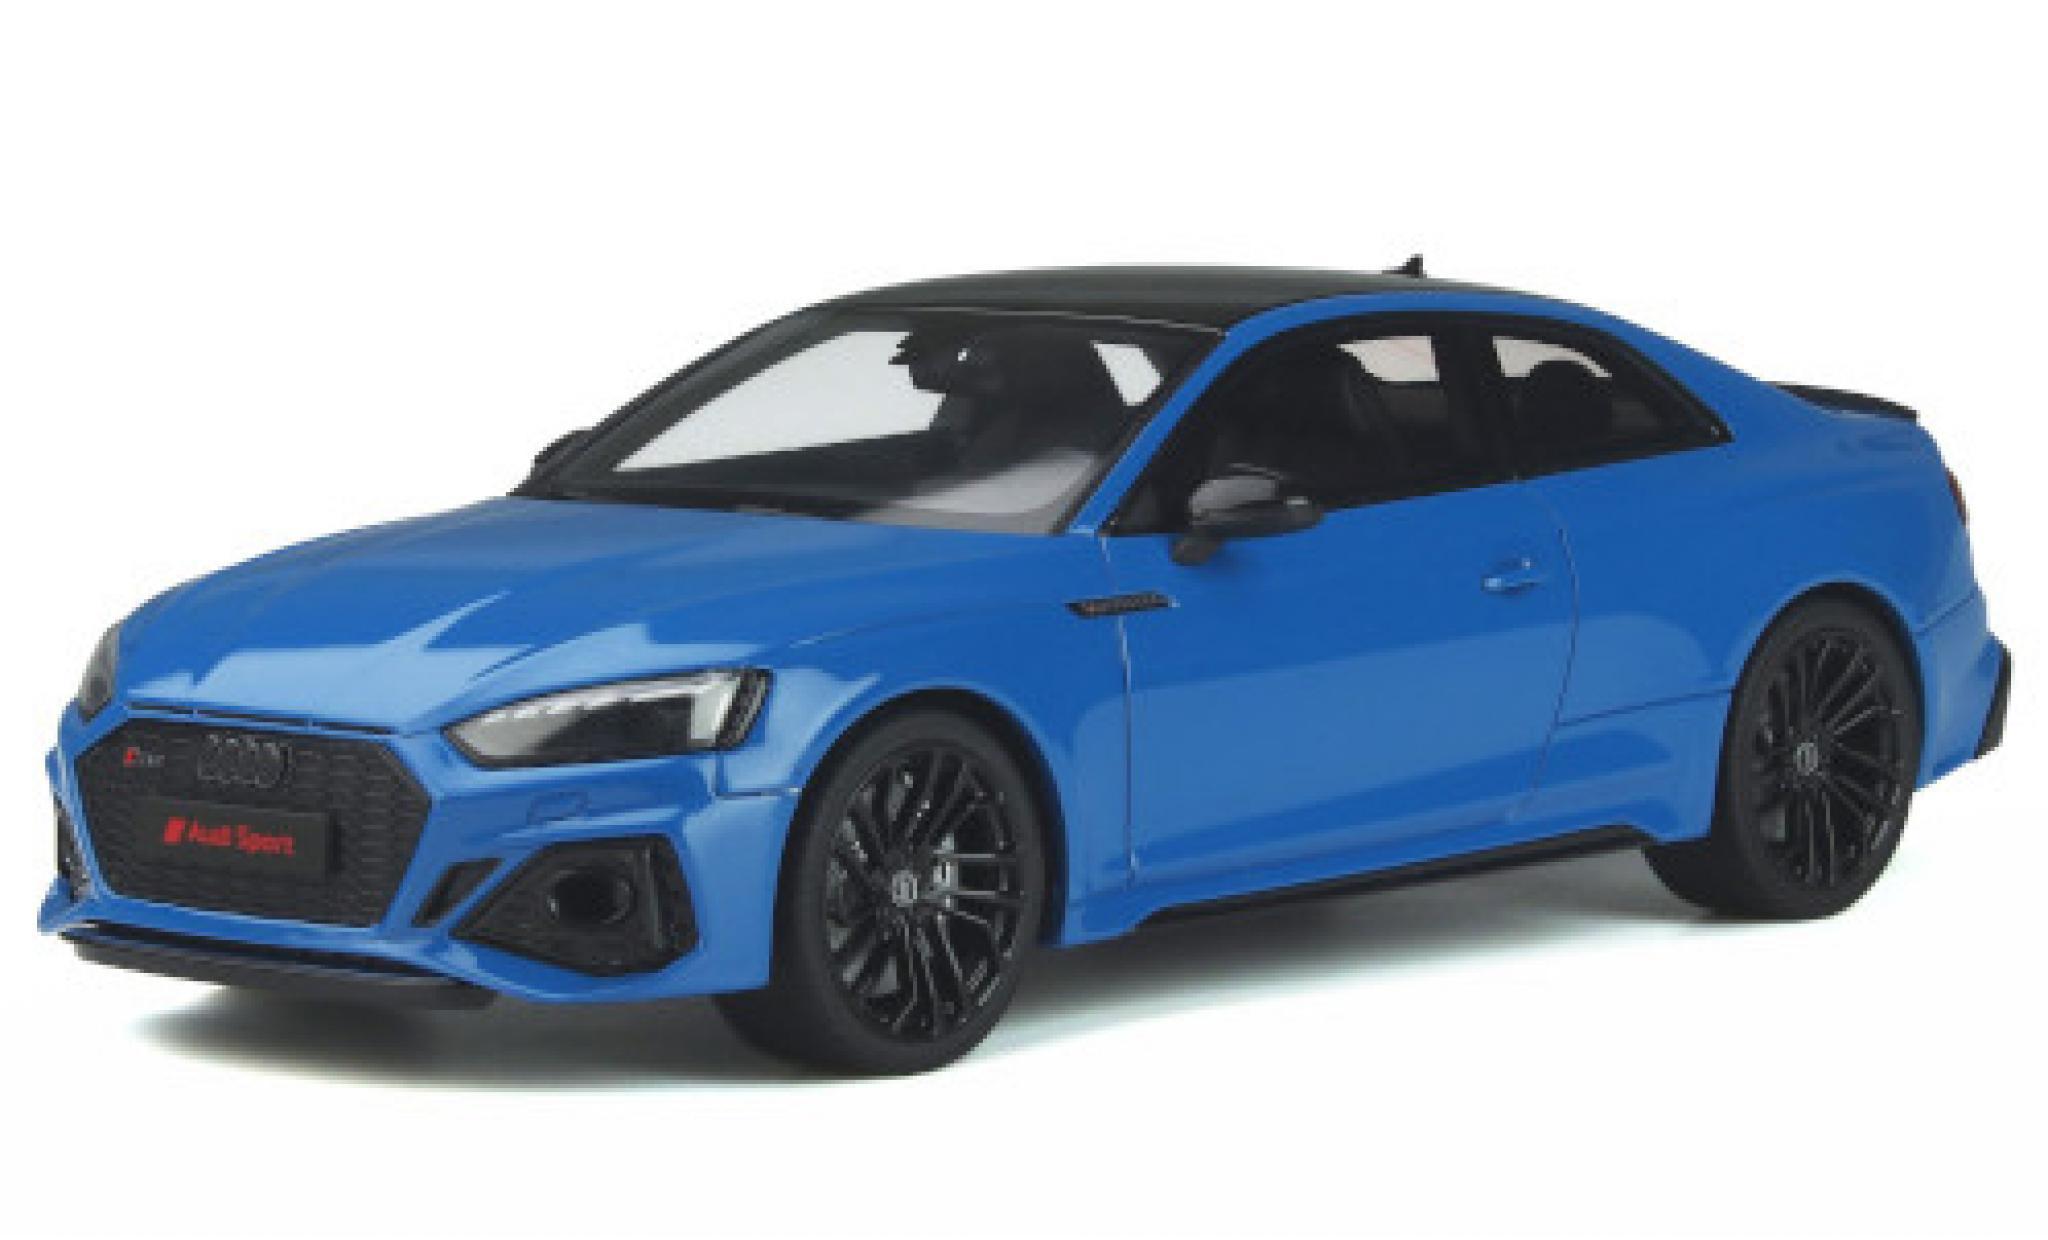 Audi RS5 1/18 GT Spirit Coupe (F5) blue 2020